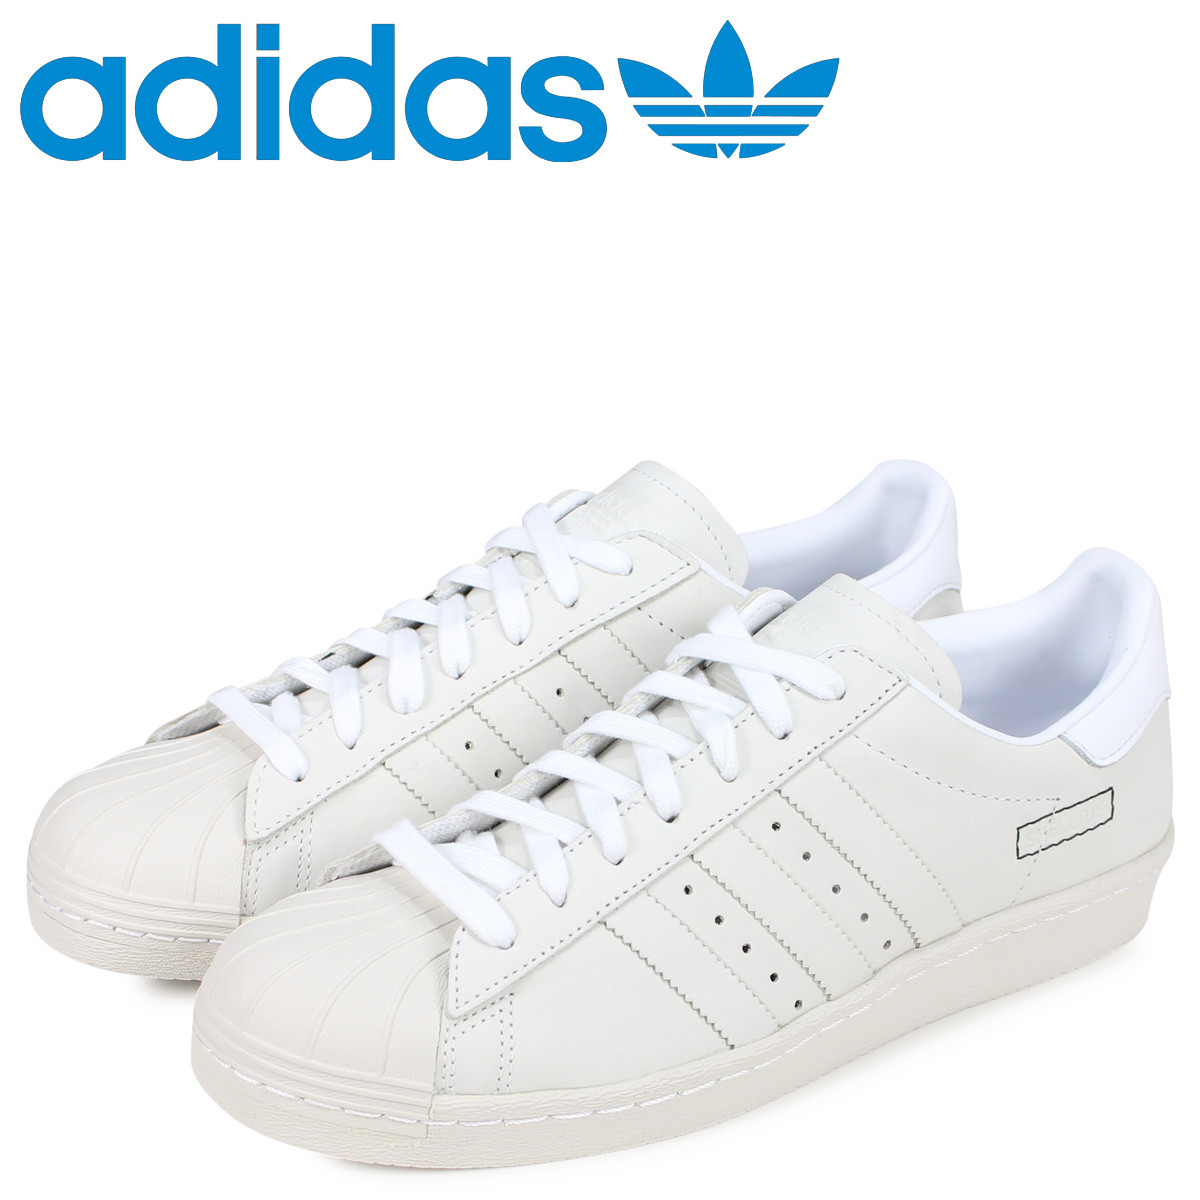 adidas Originals アディダス オリジナルス スーパースター スニーカー メンズ SUPERSTAR 80s ホワイト 白 DB2685 [3/5 新入荷]